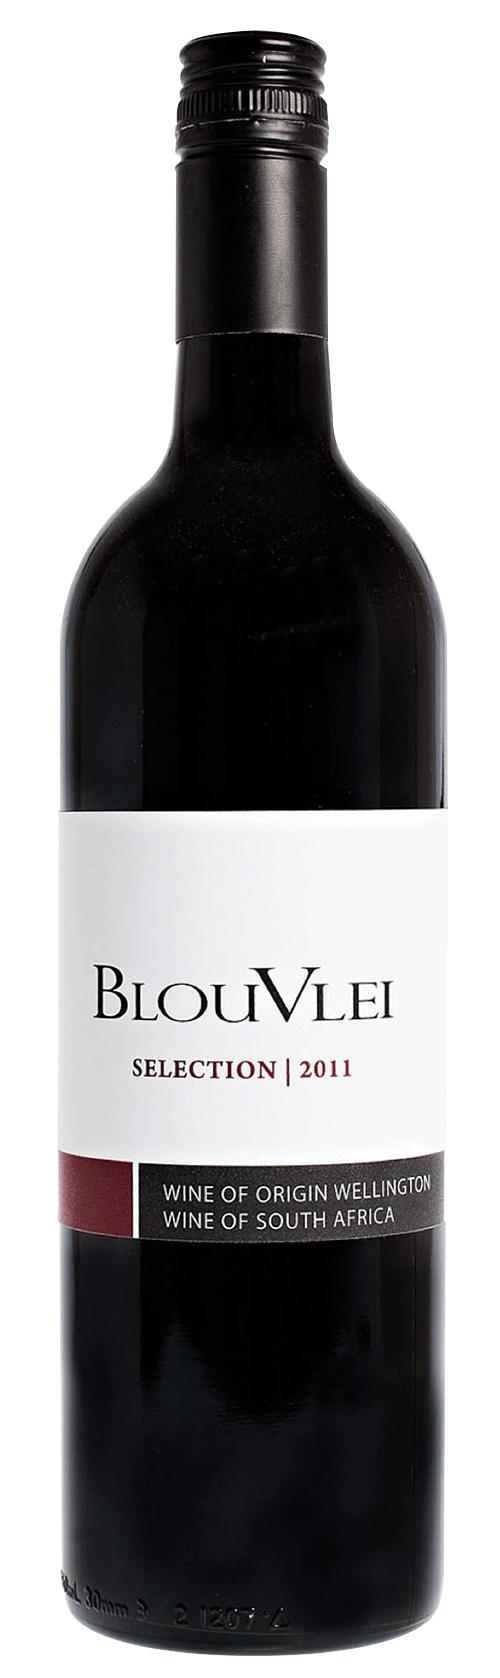 BlouVlei 2011